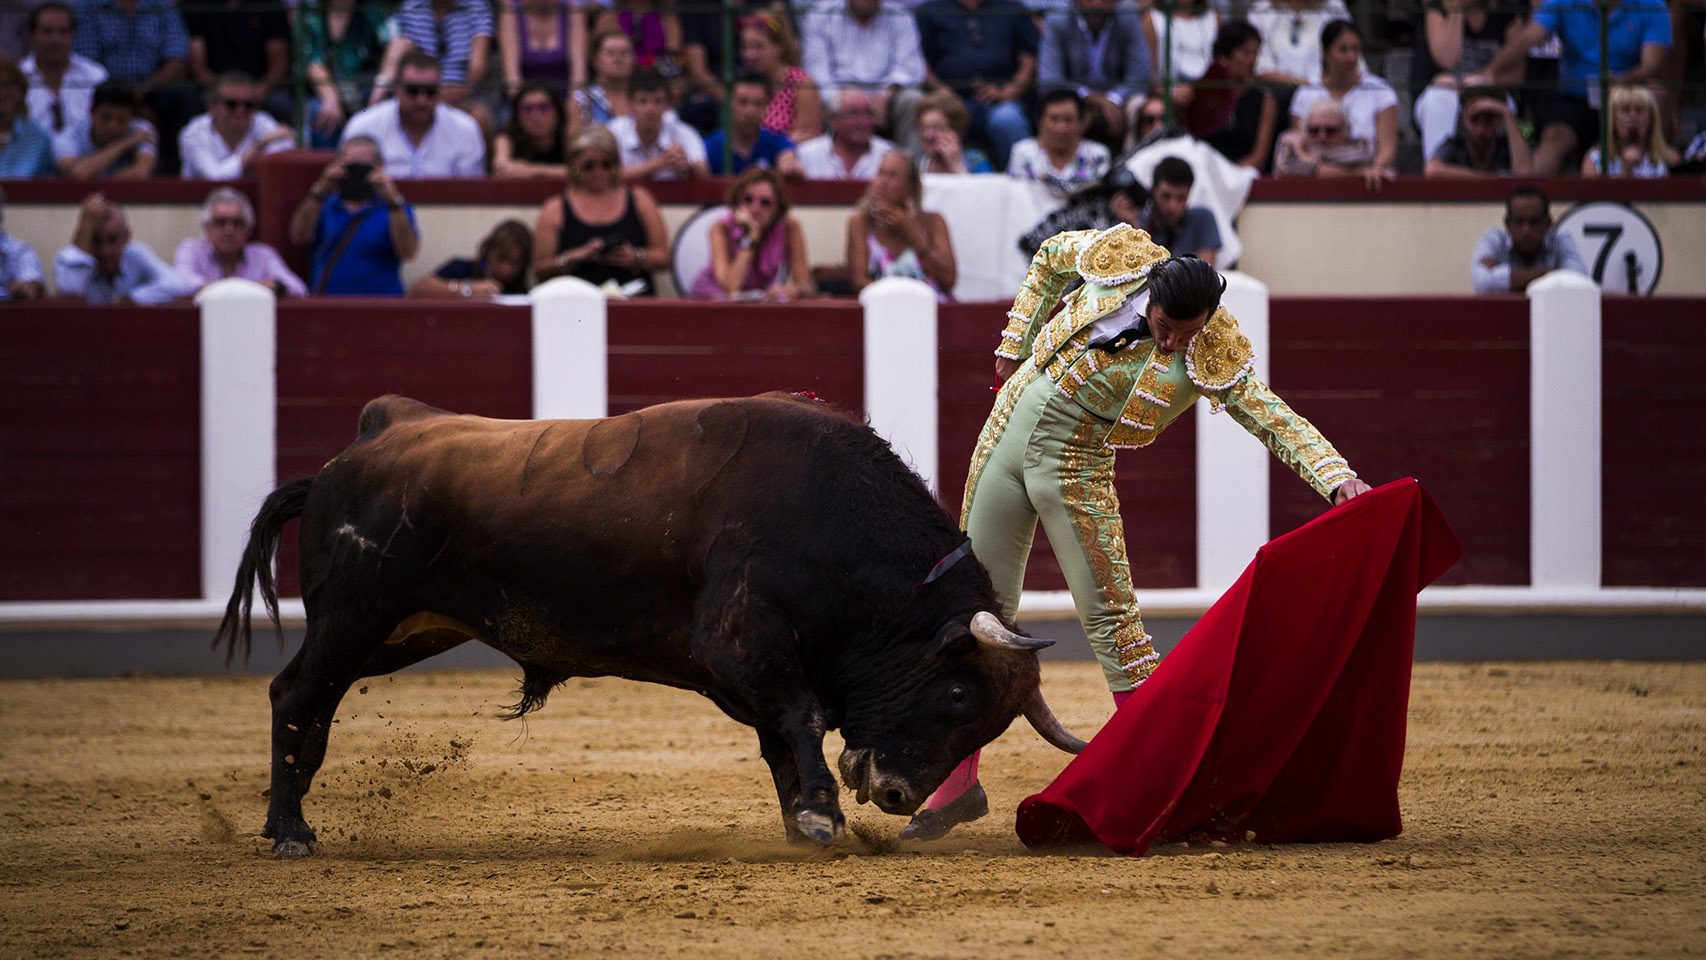 Natural de David Mora al mejor toro de una blanda corrida de El Pilar.